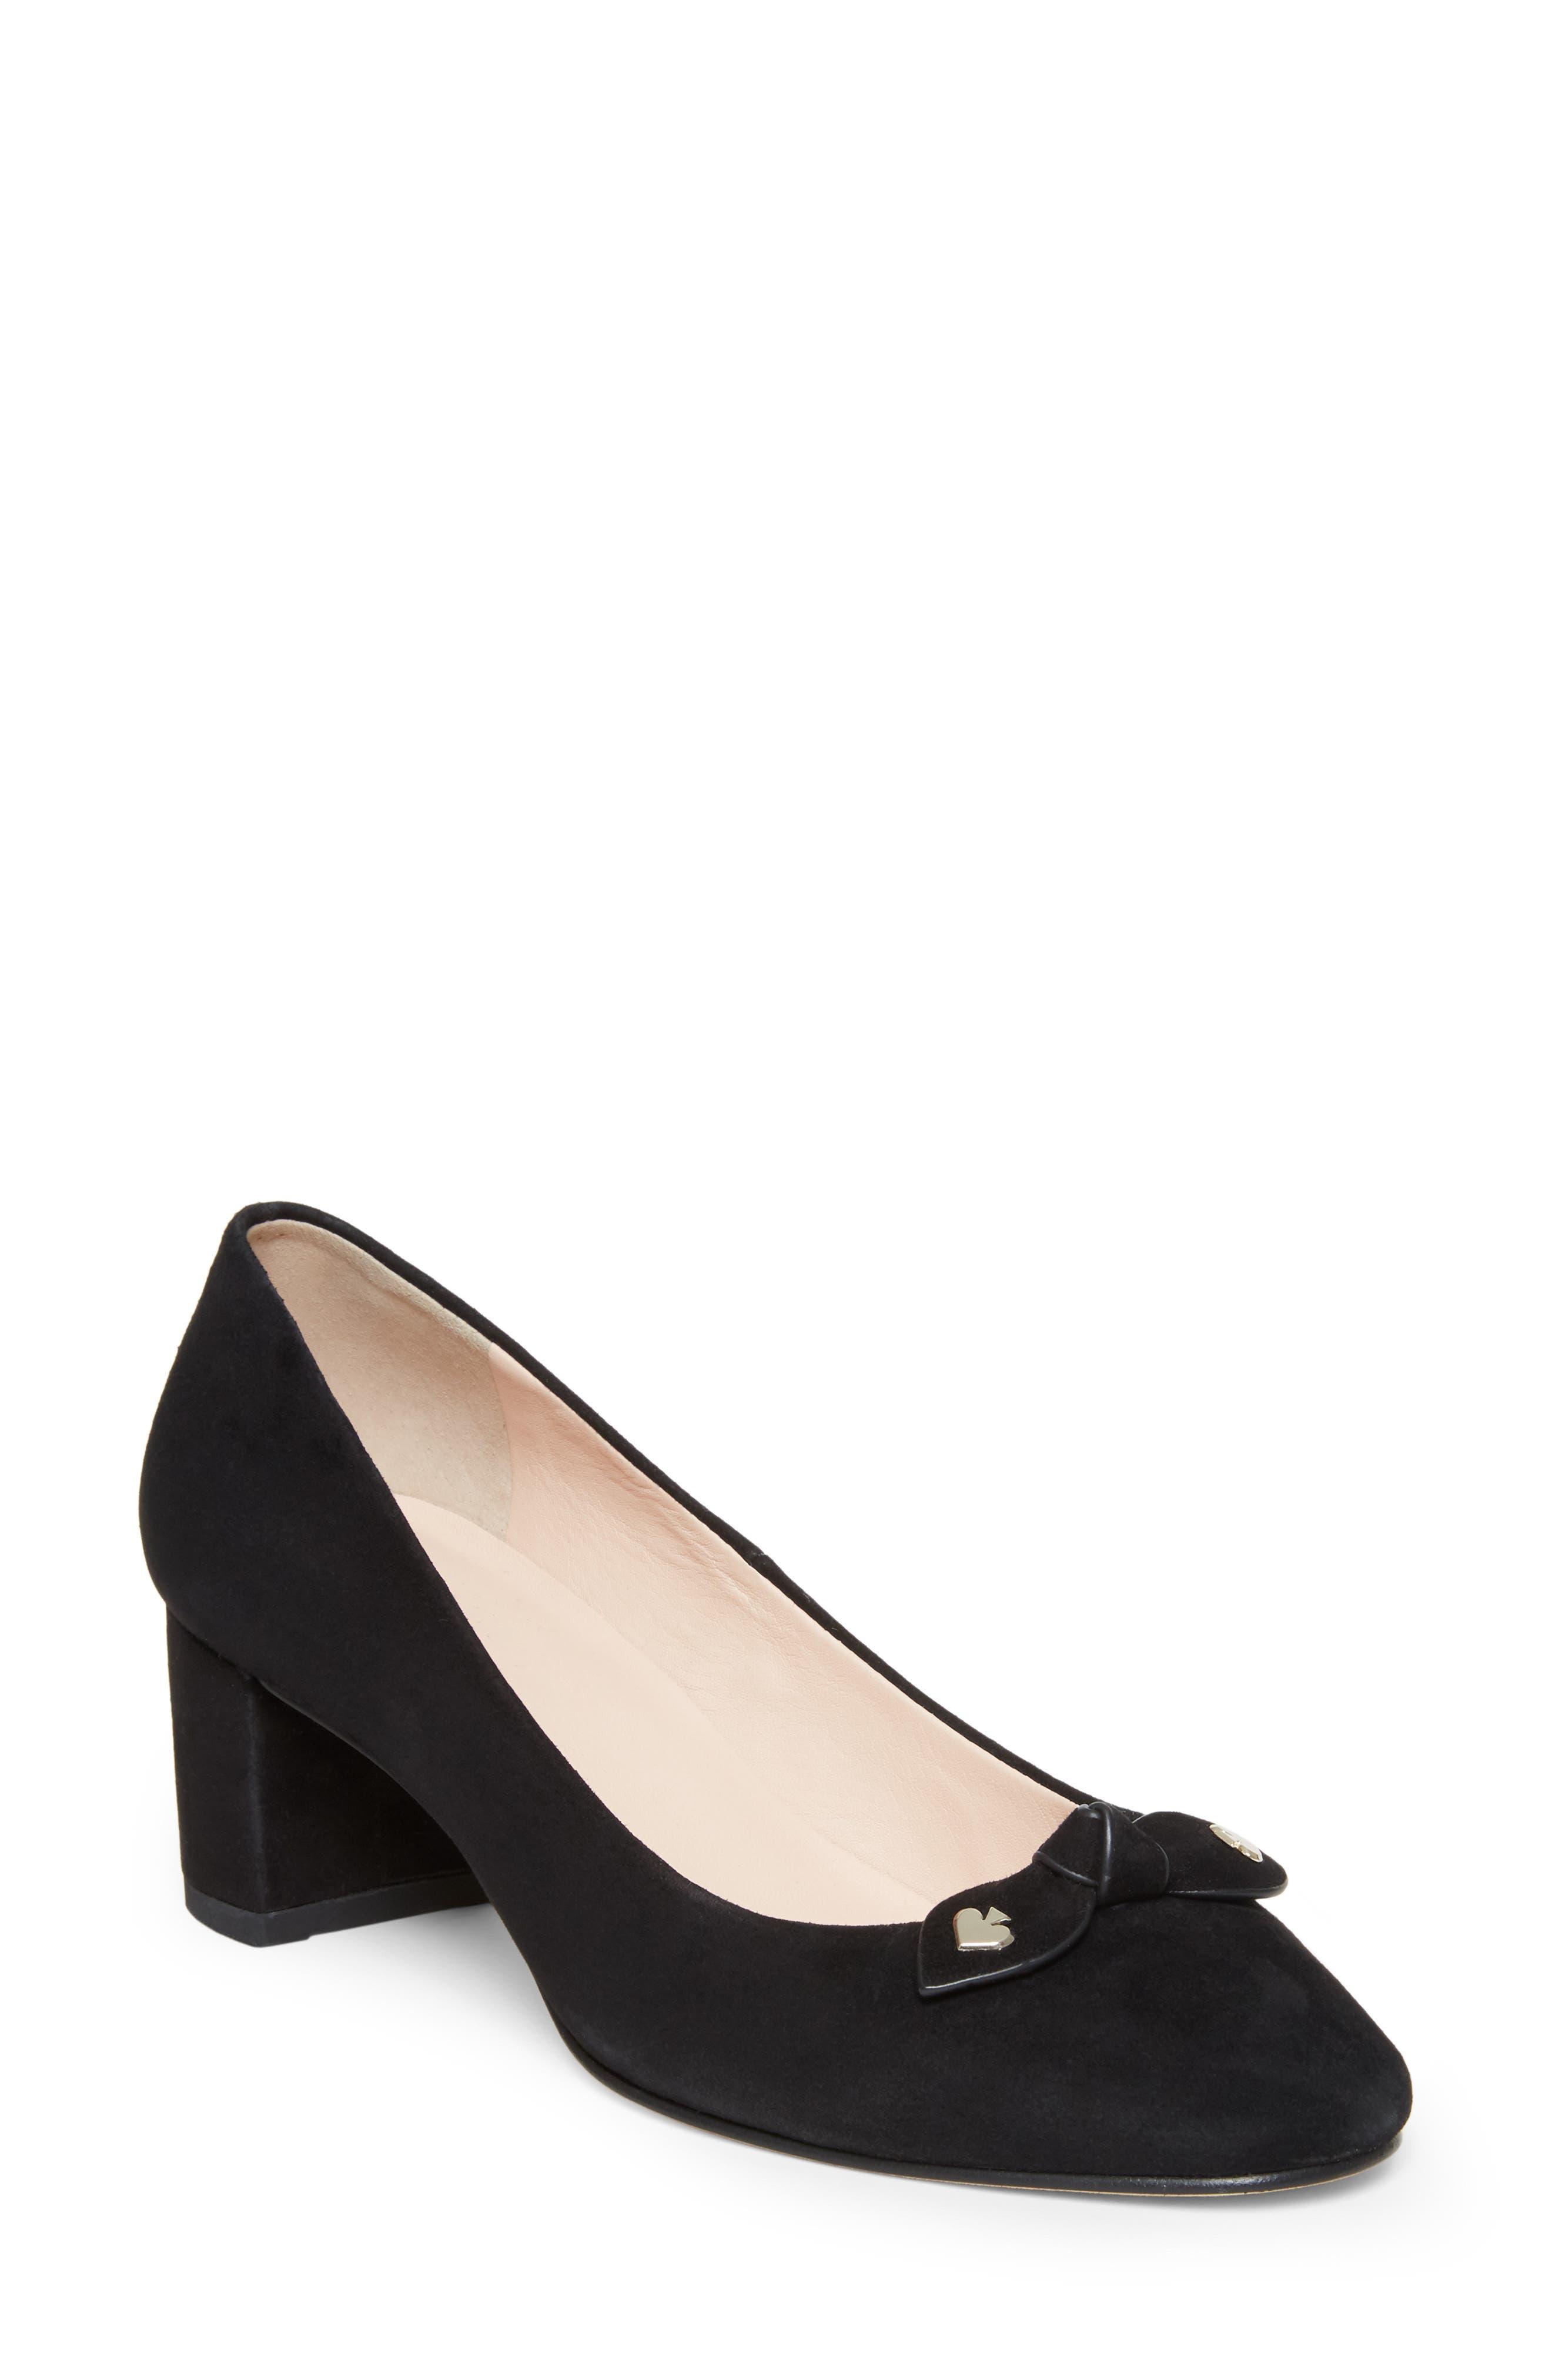 Kate Spade New York Benice Block Heel Pump- Black